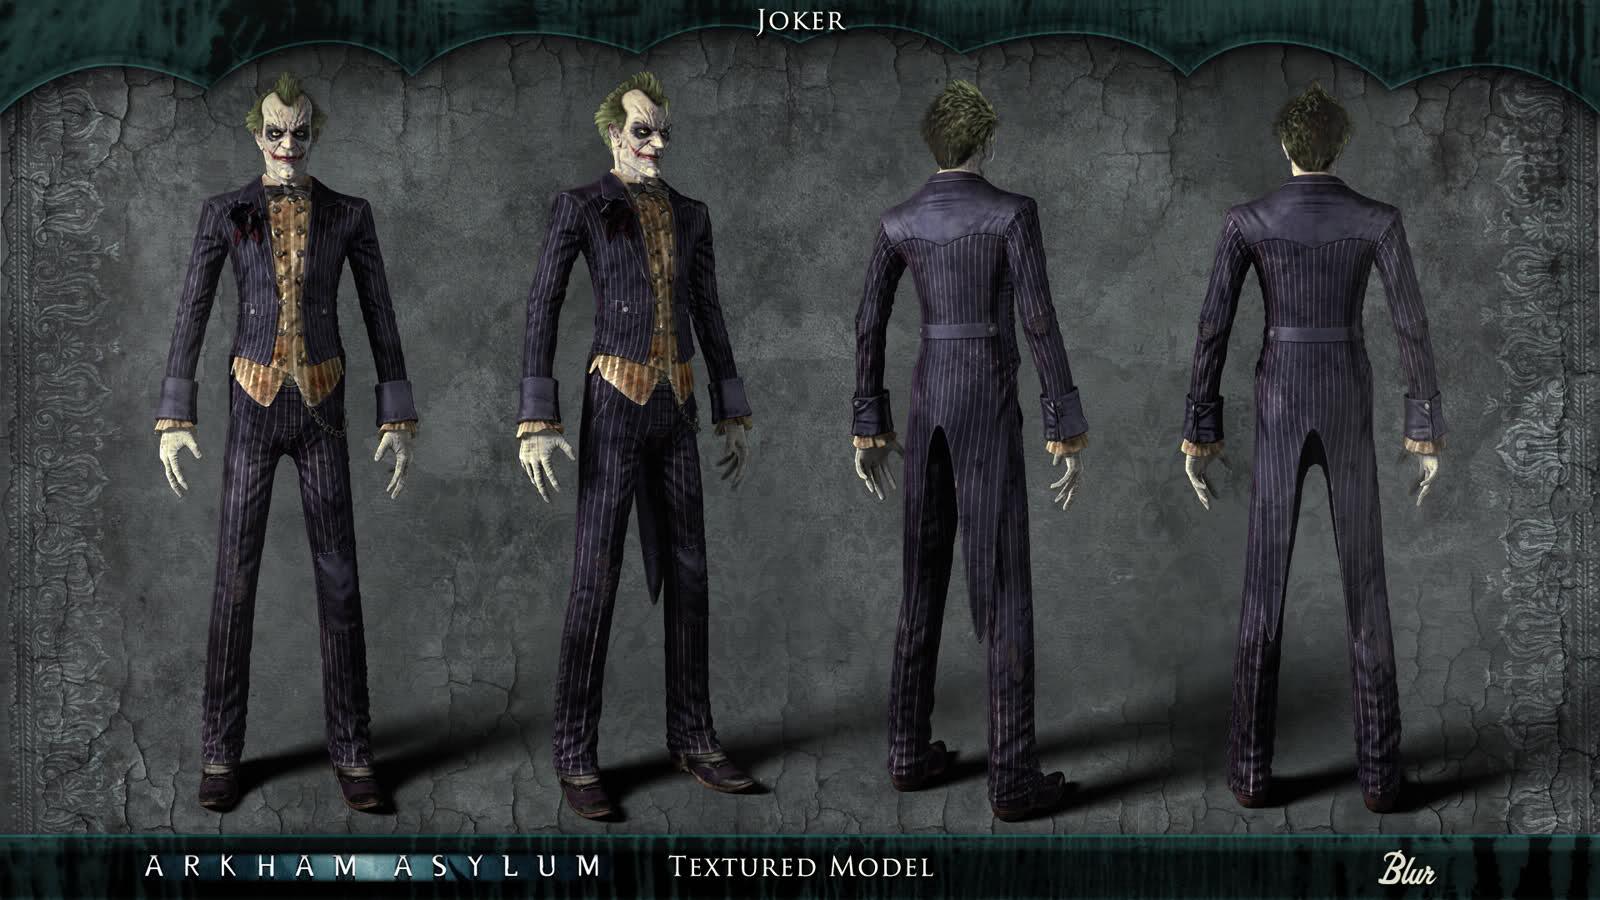 Джокер аркхем 7